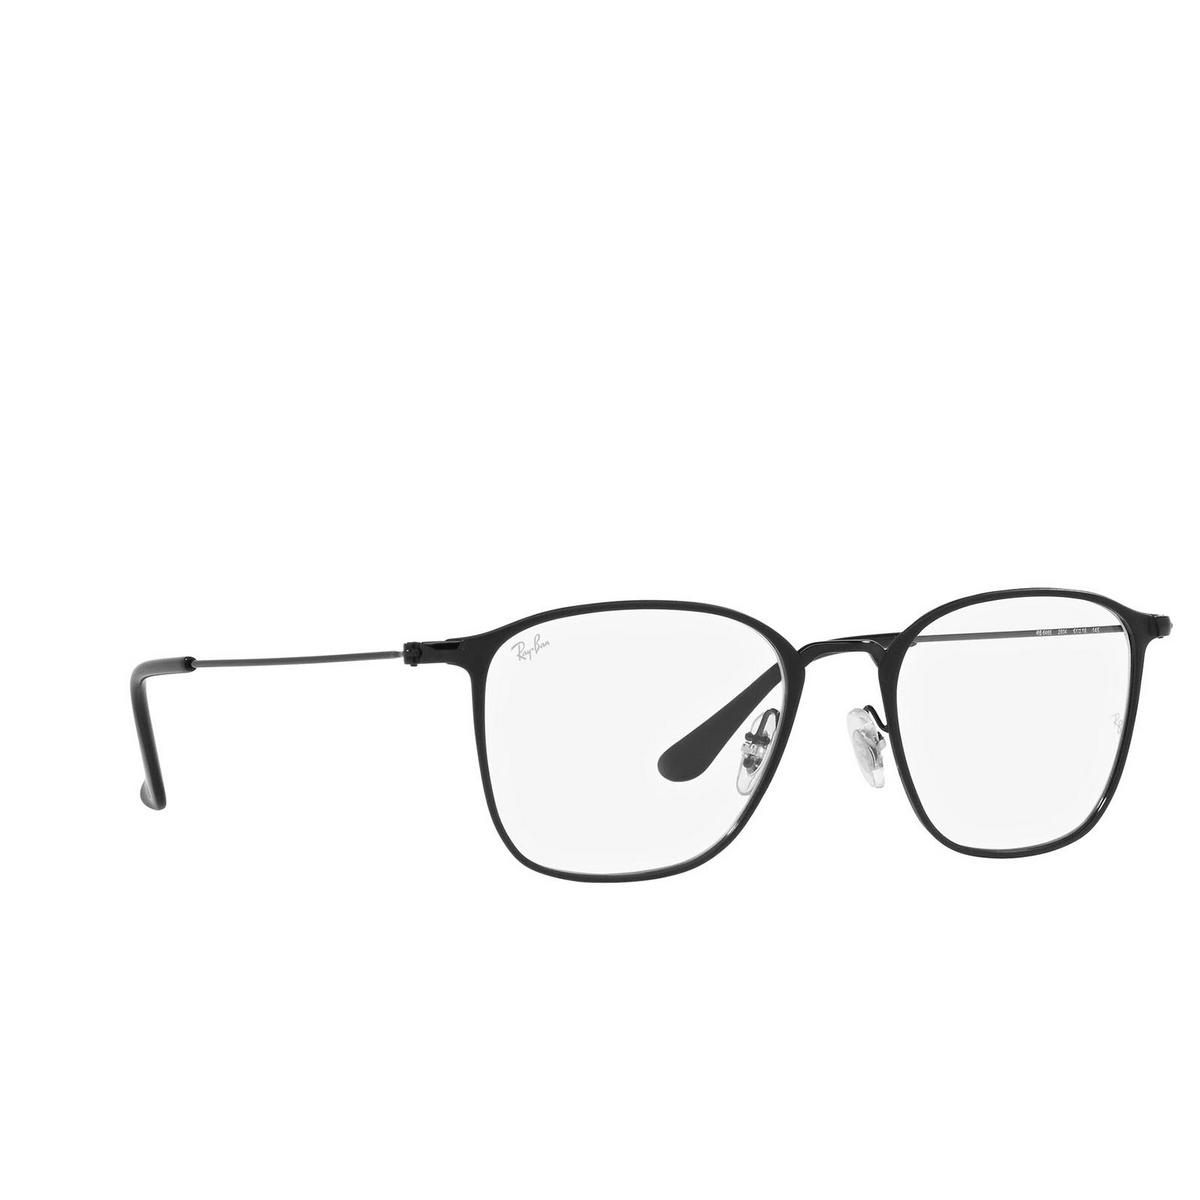 Ray-Ban® Square Eyeglasses: RX6466 color Matte Black On Black 2904.